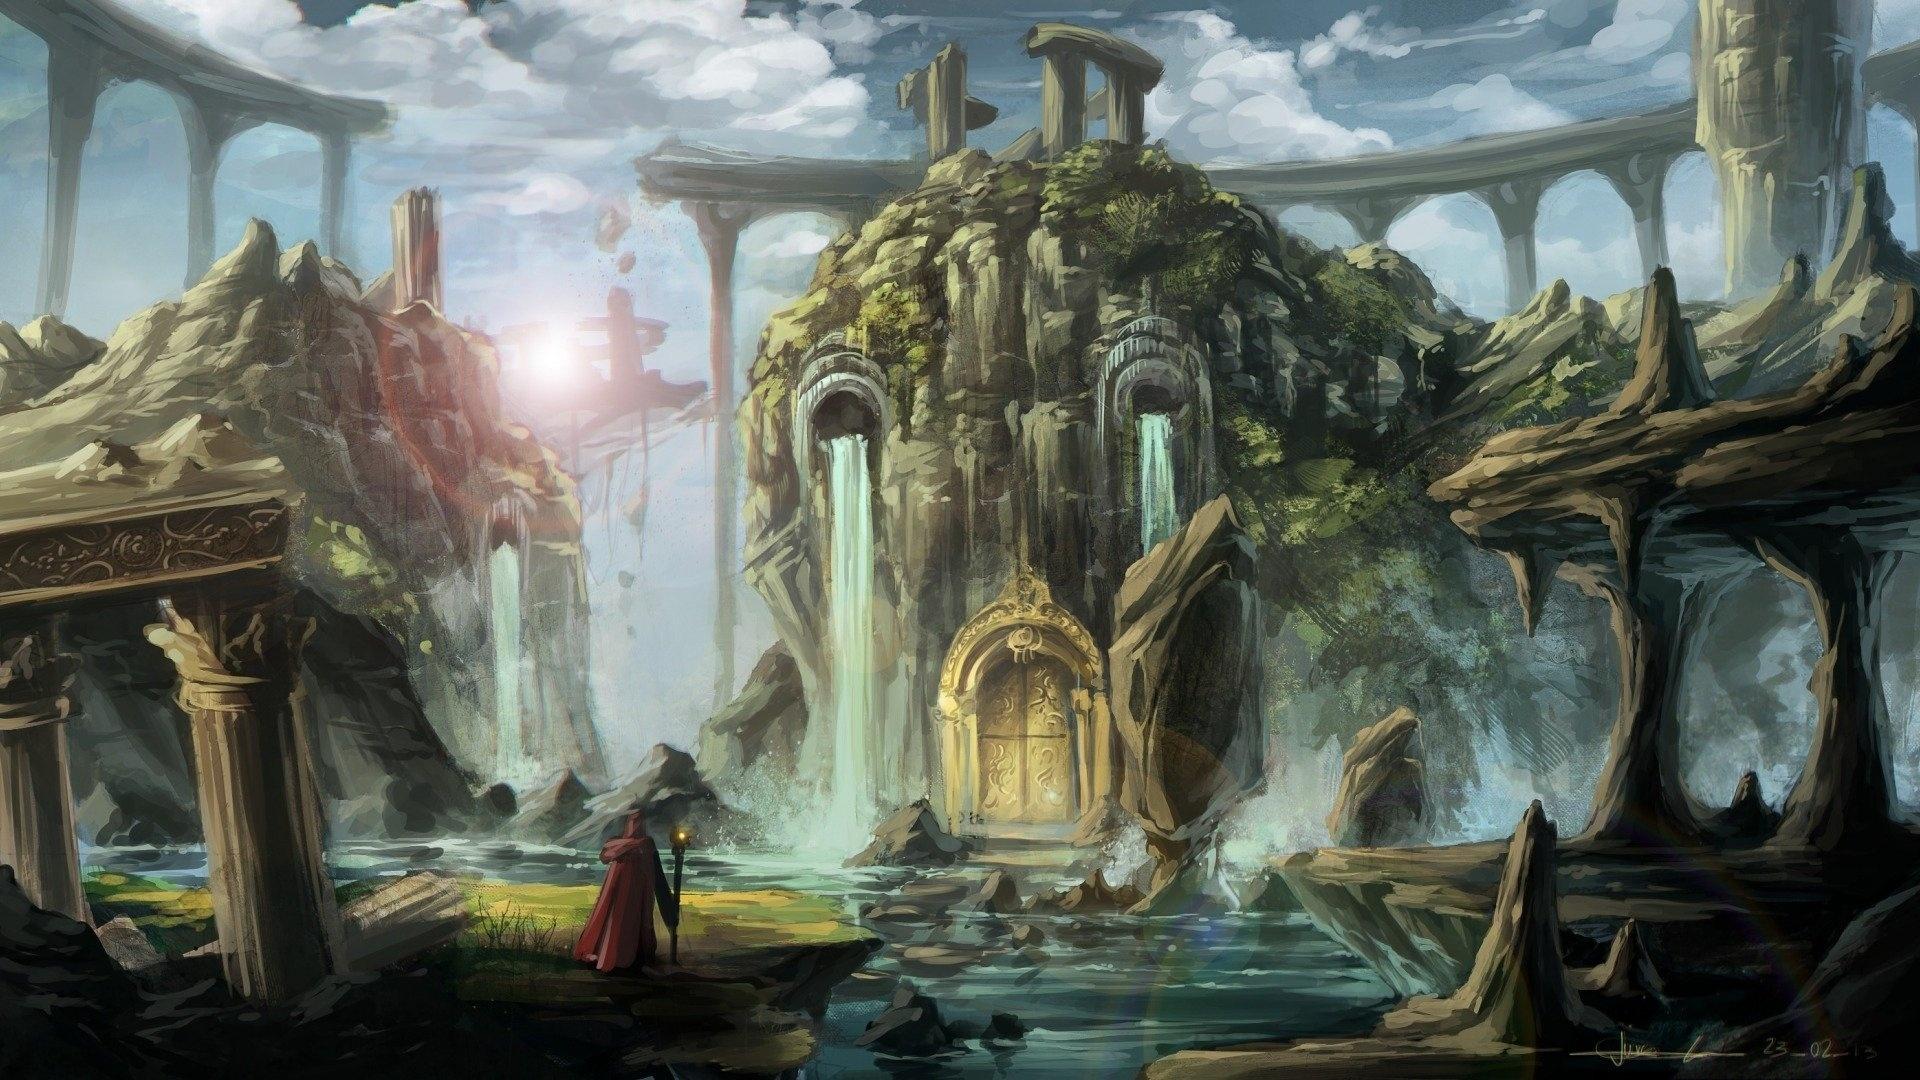 Ruins Art hd background